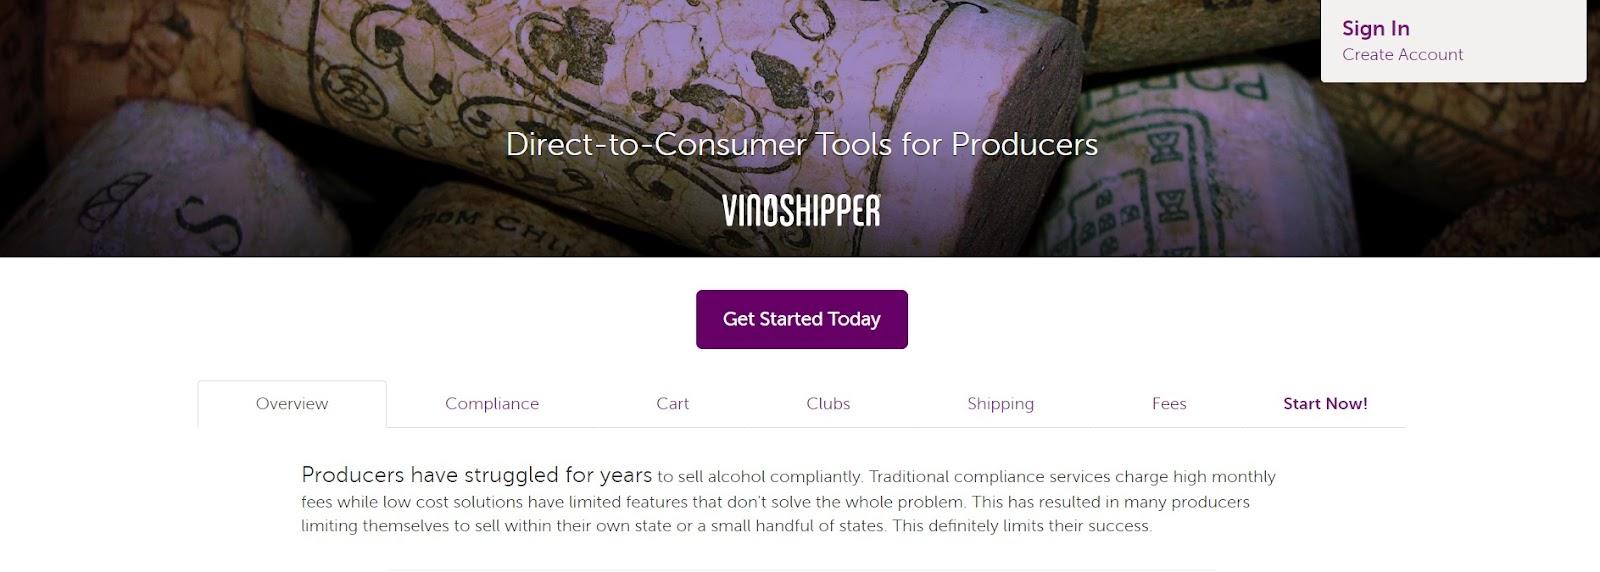 VinoShipper's landing page